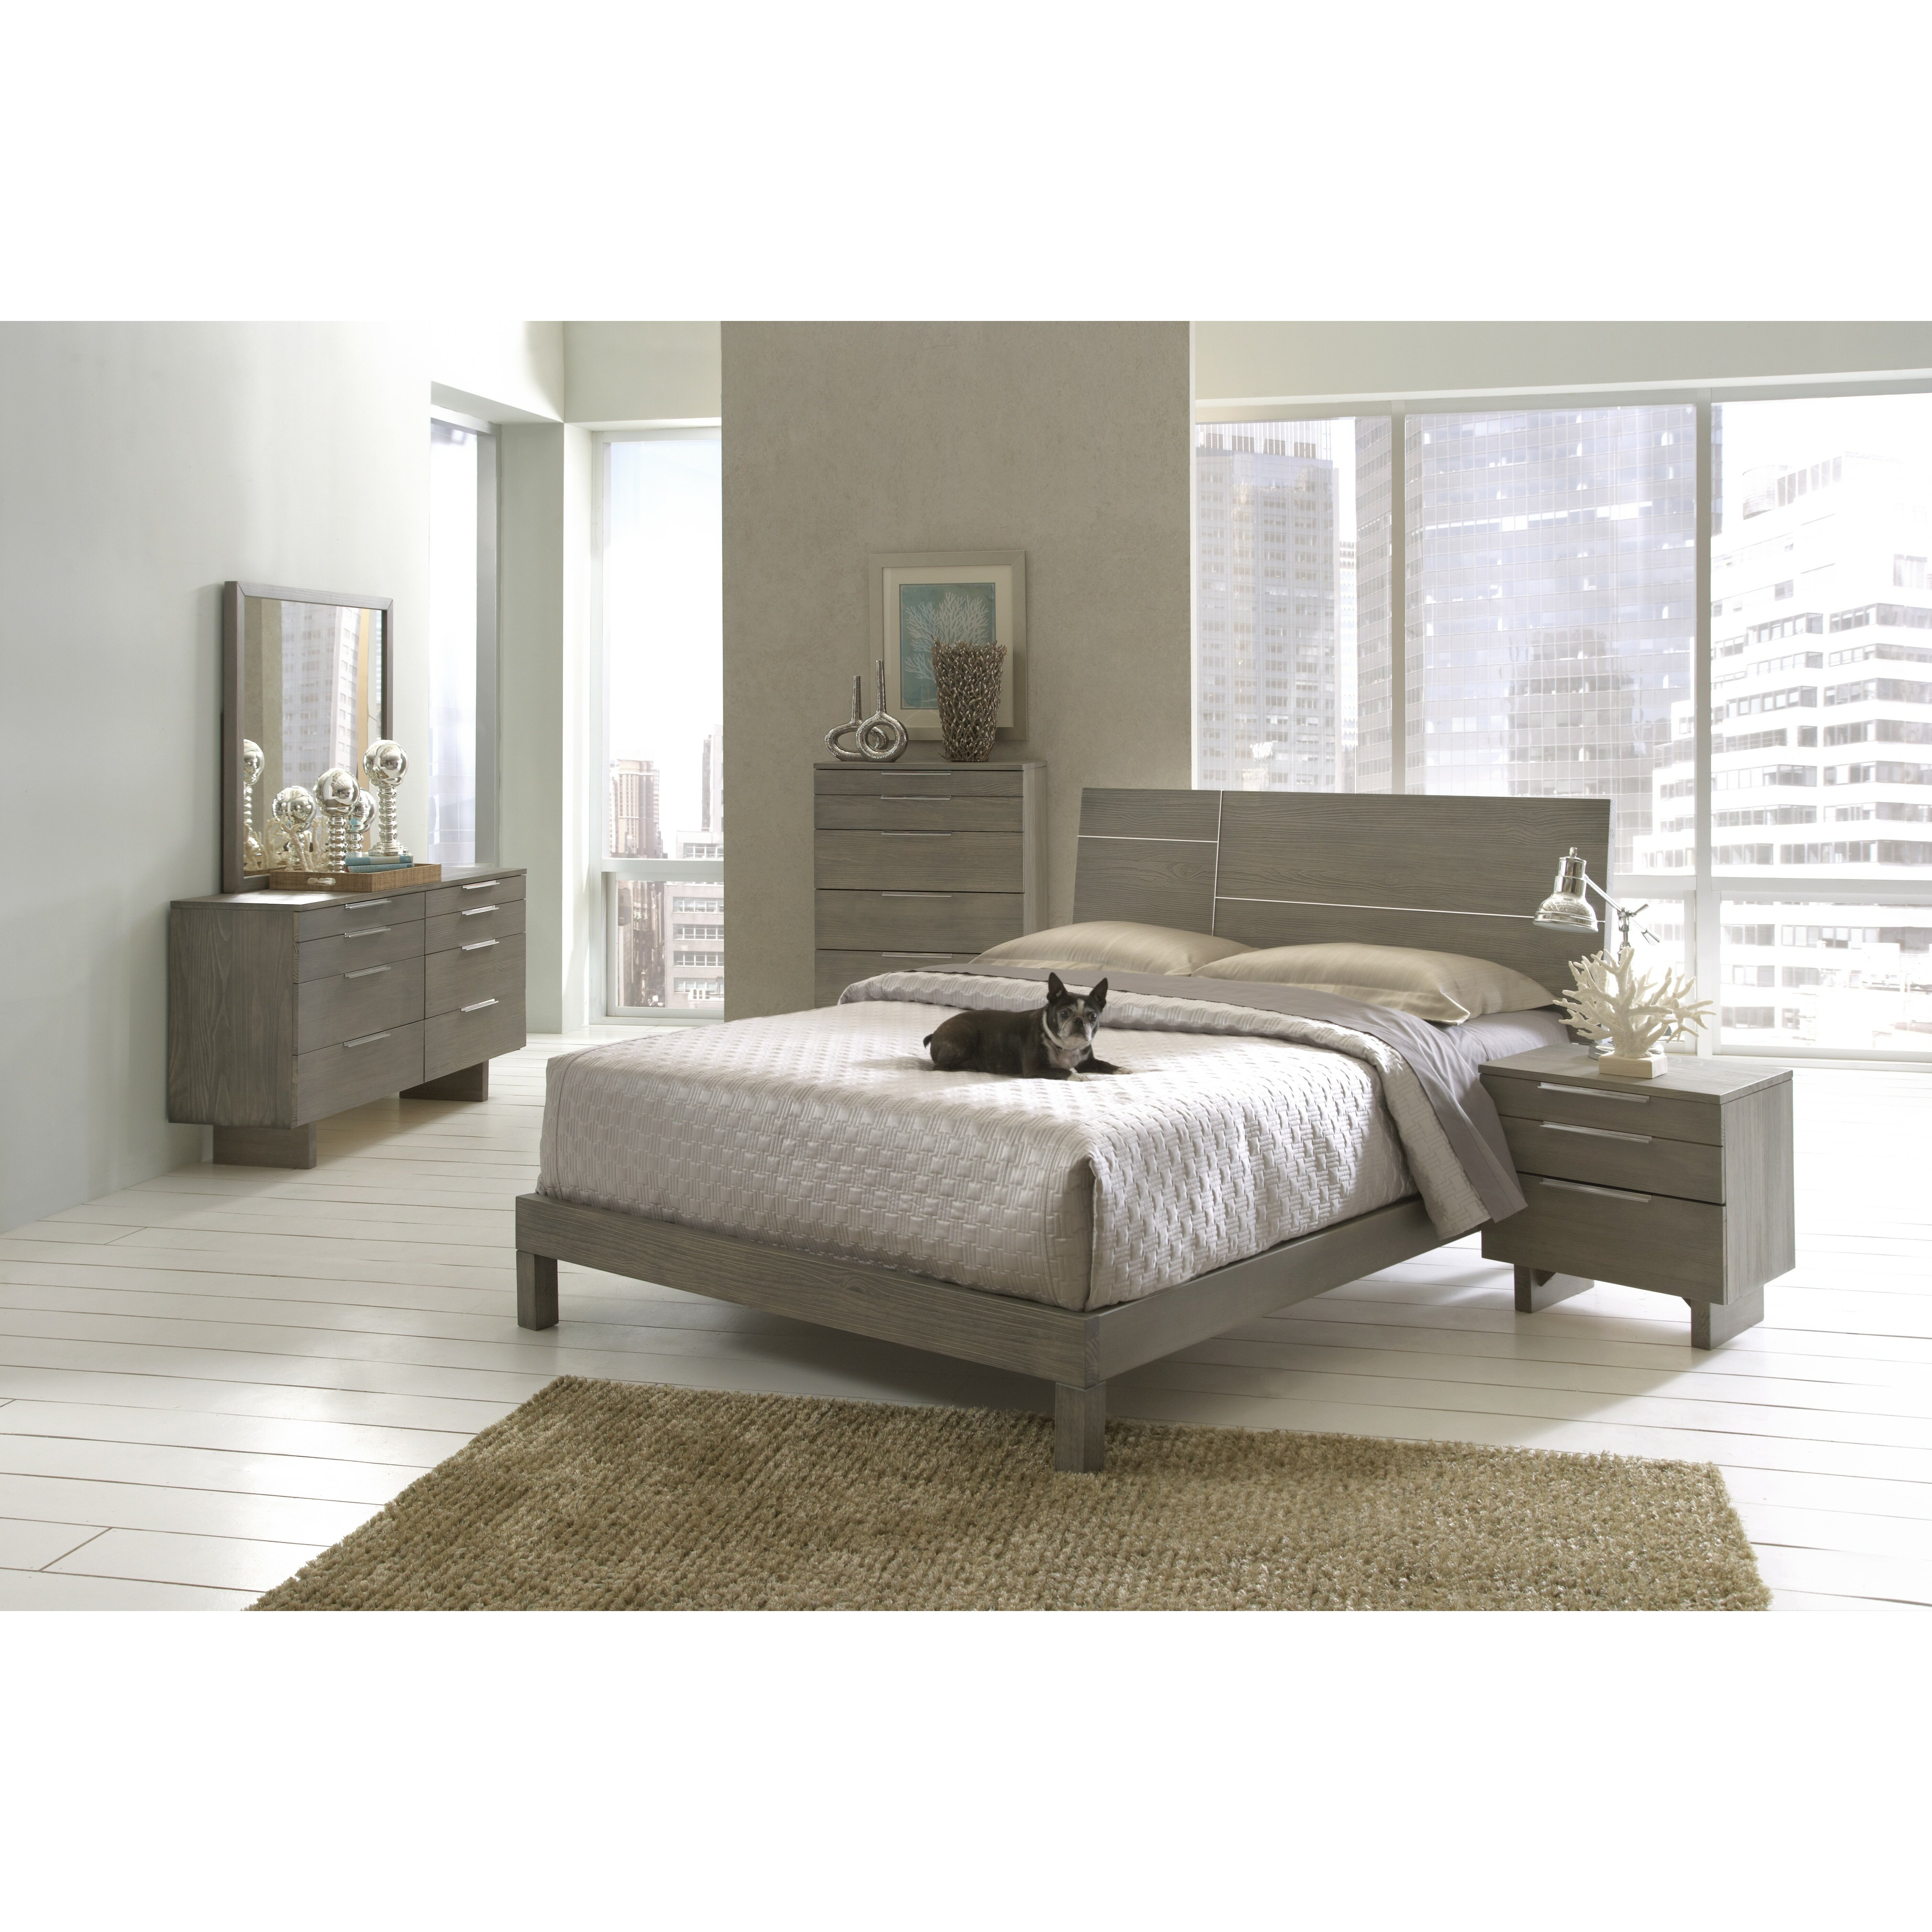 Wildon Home Violet Platform Customizable Bedroom Set Reviews Allmodern